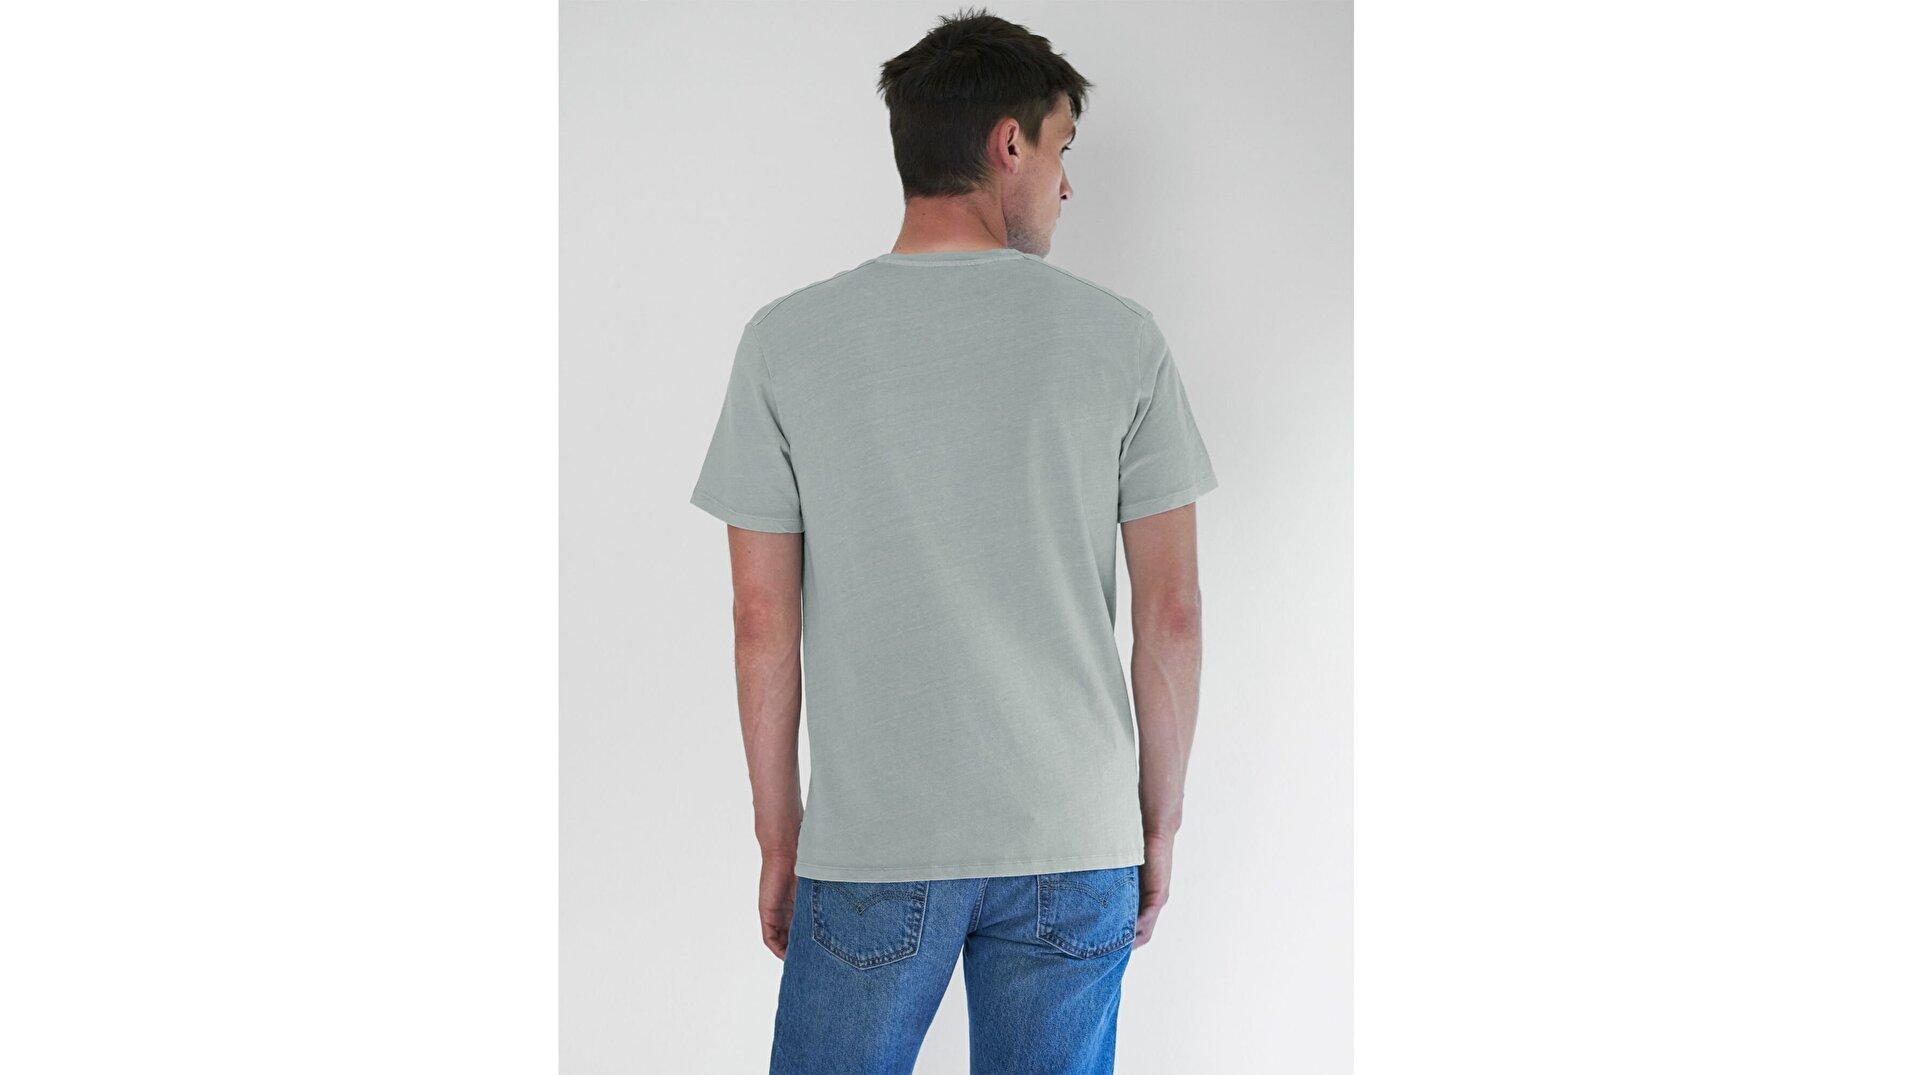 Wellthread Graphic Tee Plant Cotton Açık Gri Erkek Tişört